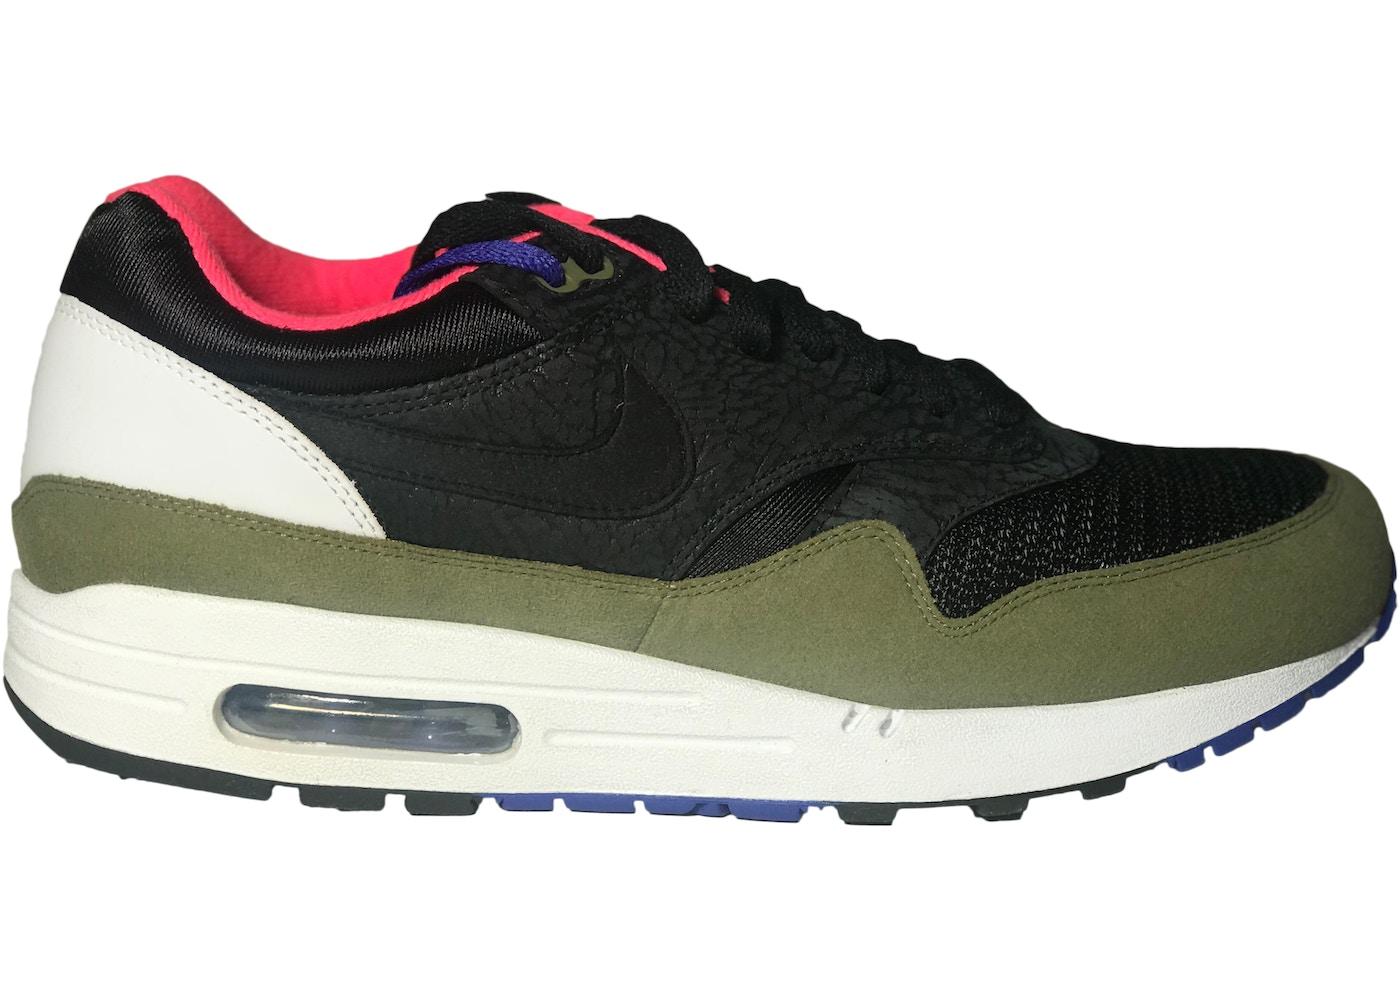 size 40 9e570 034e6 Nike Air Max Shoes - Average Sale Price